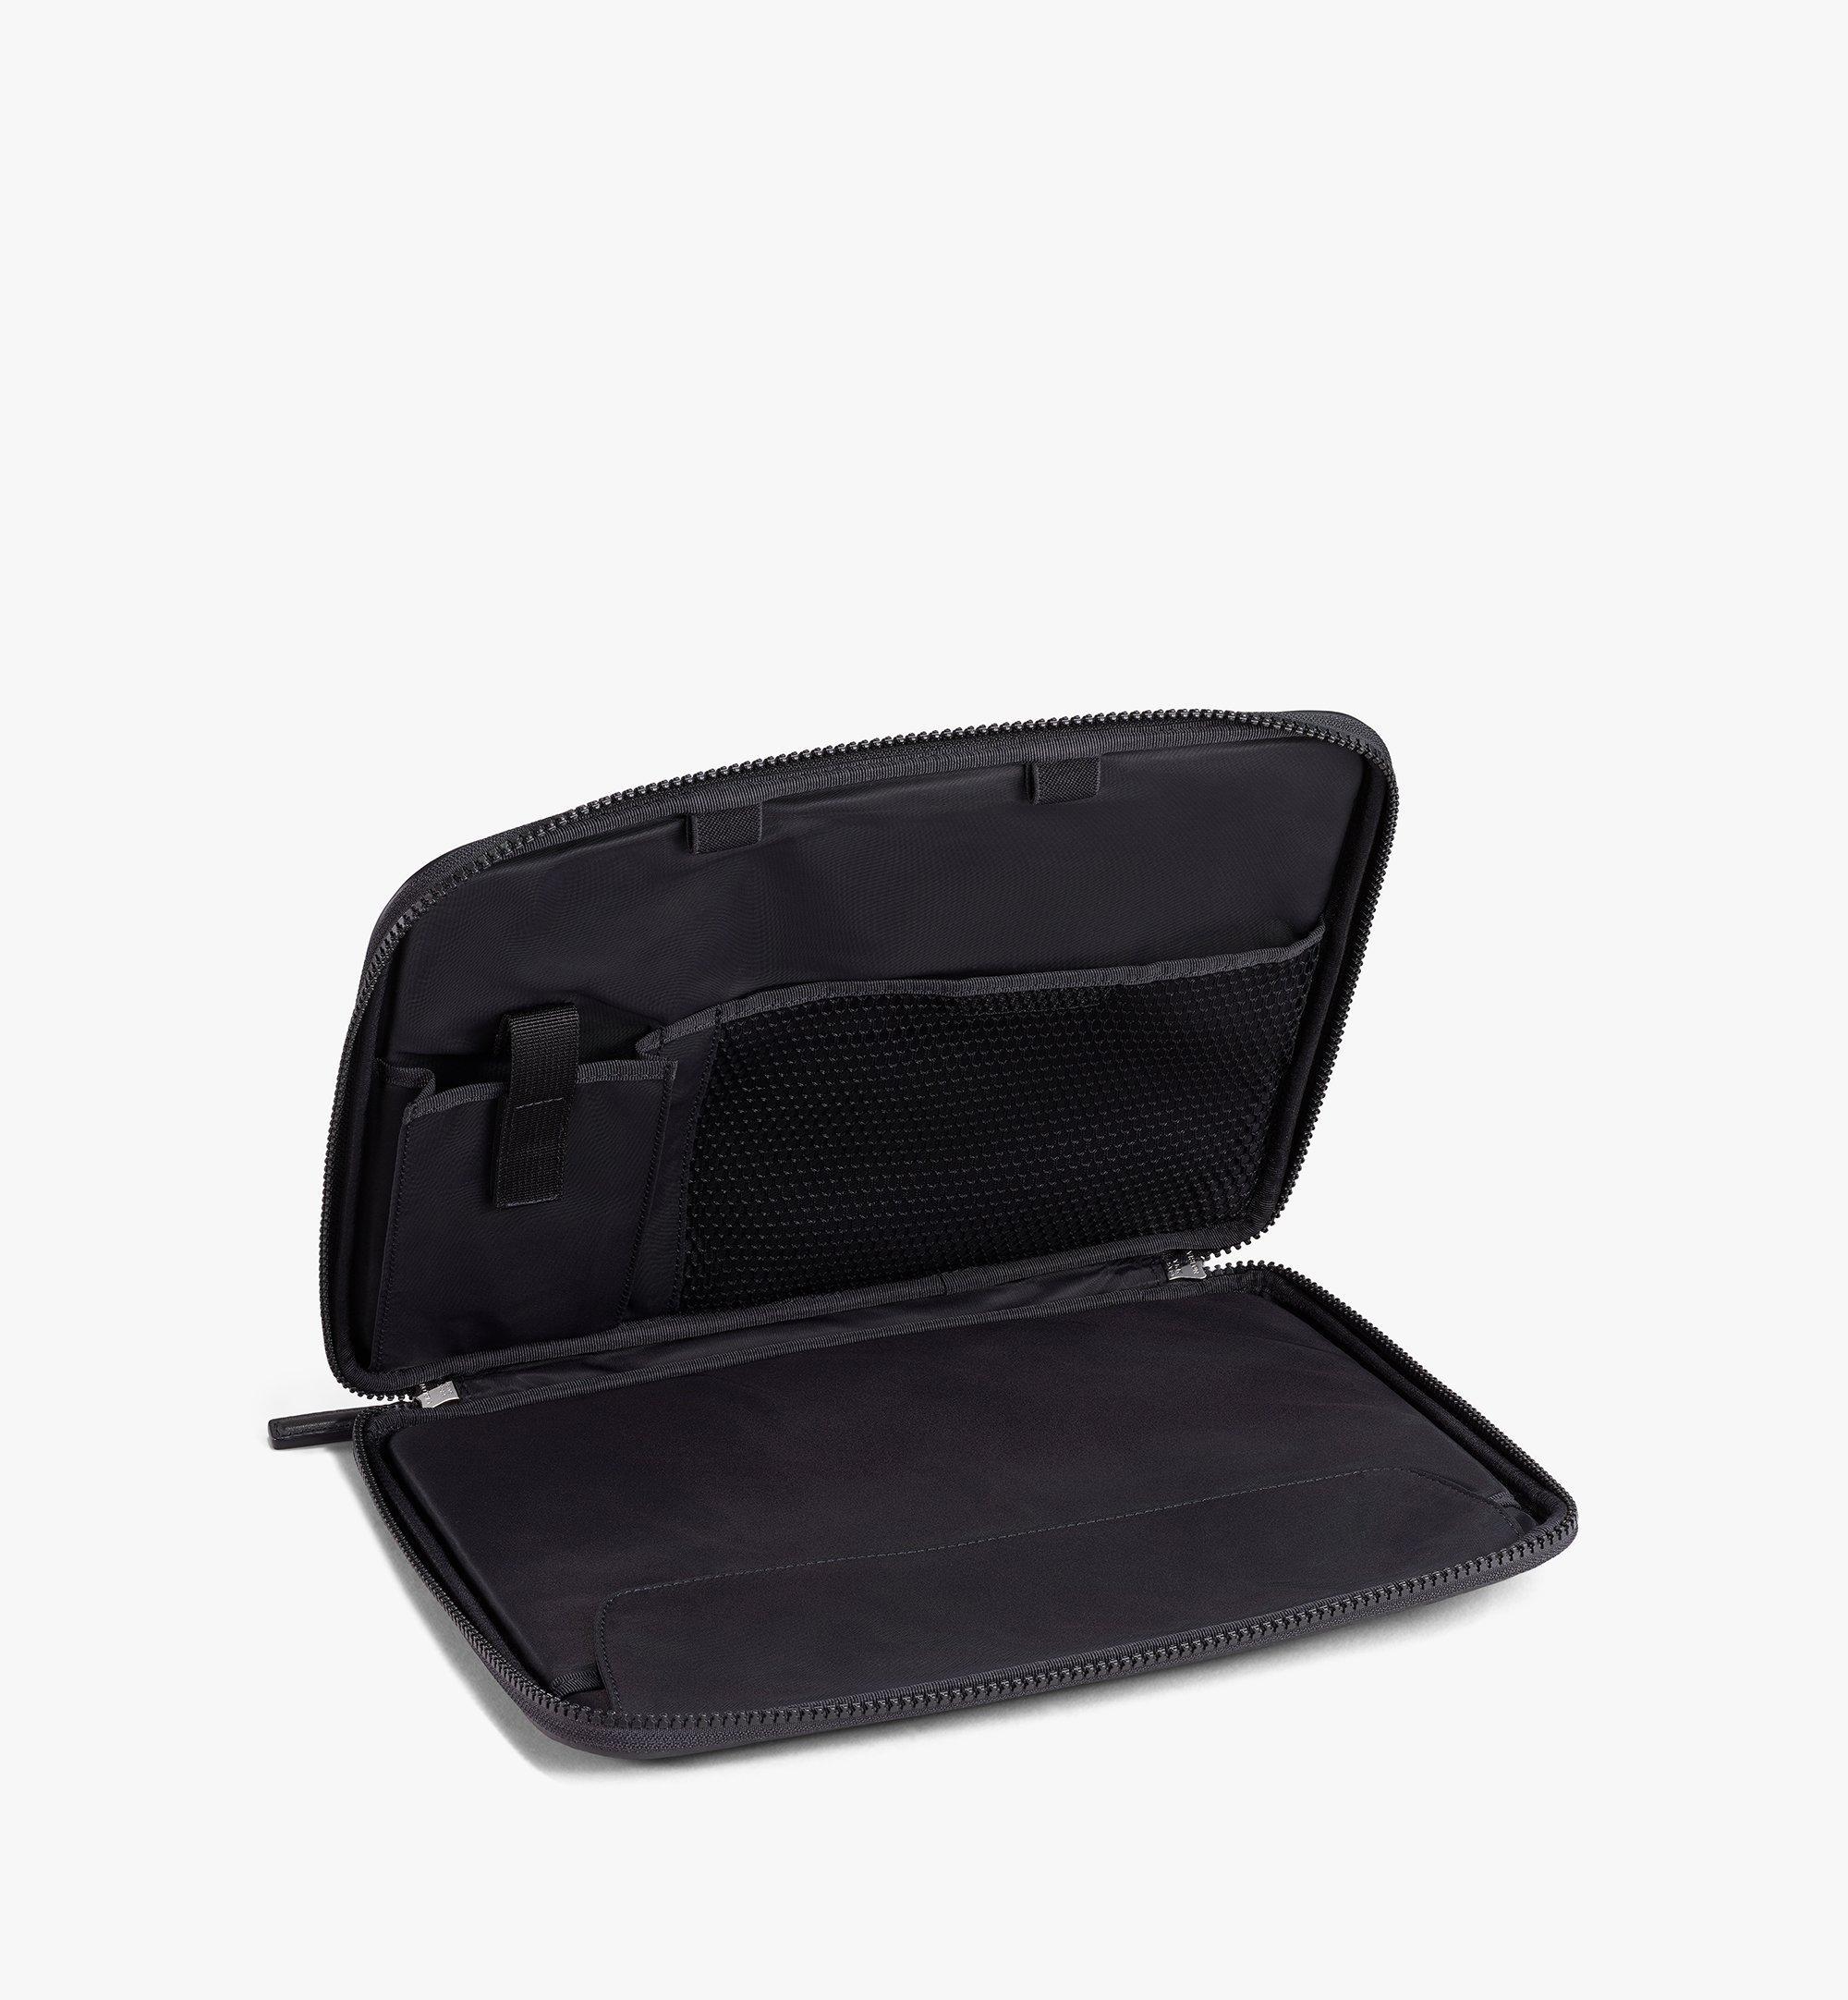 MCM Visetos Original 13 吋 iPad 保護套 Black MXEAAVI03BK001 更多視圖 1